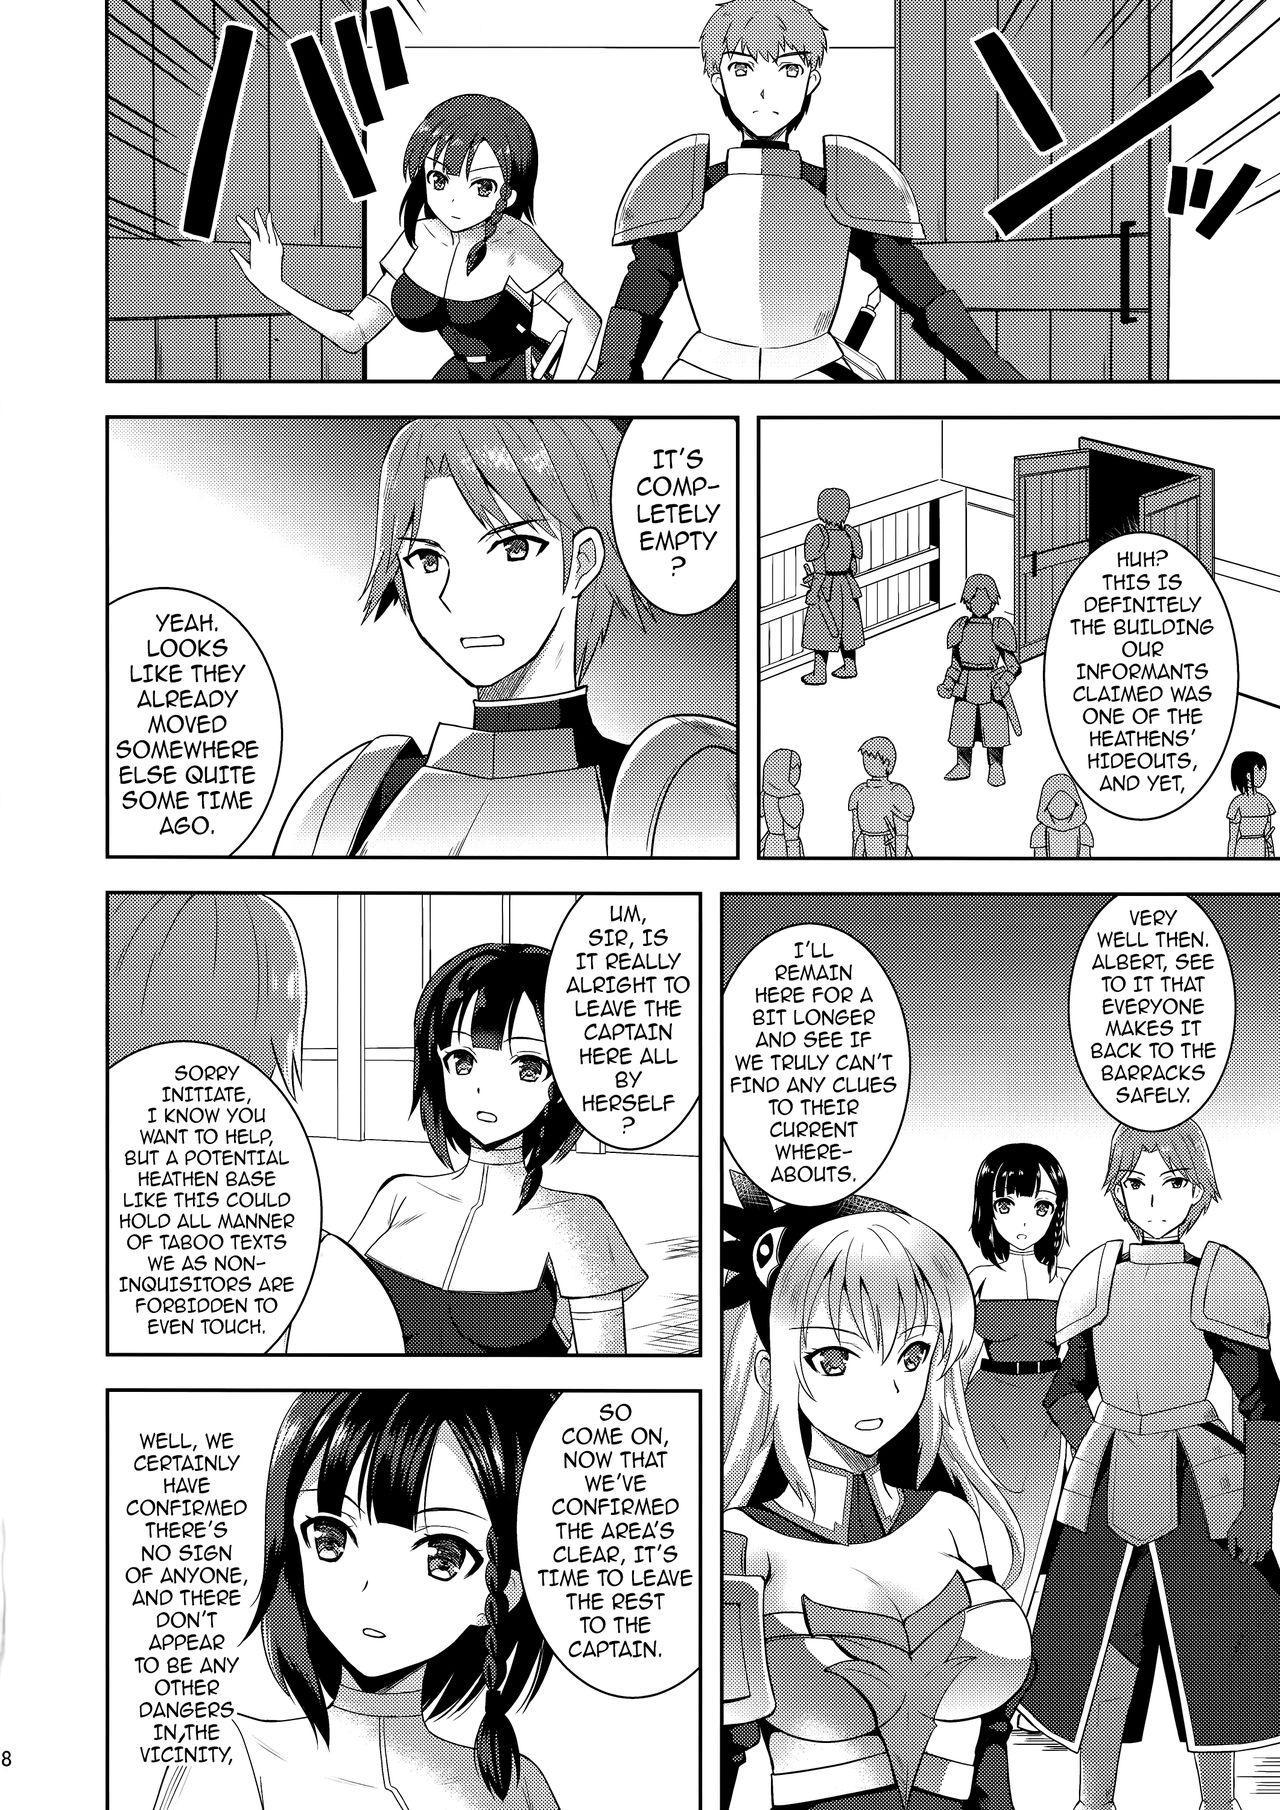 (C96) [Chococornet (Tenro Aya)] Infection - Shinmai Kishi Lavinia no Junan | Infection - The Passion of a Novice Knight  [English] {darknight} 6